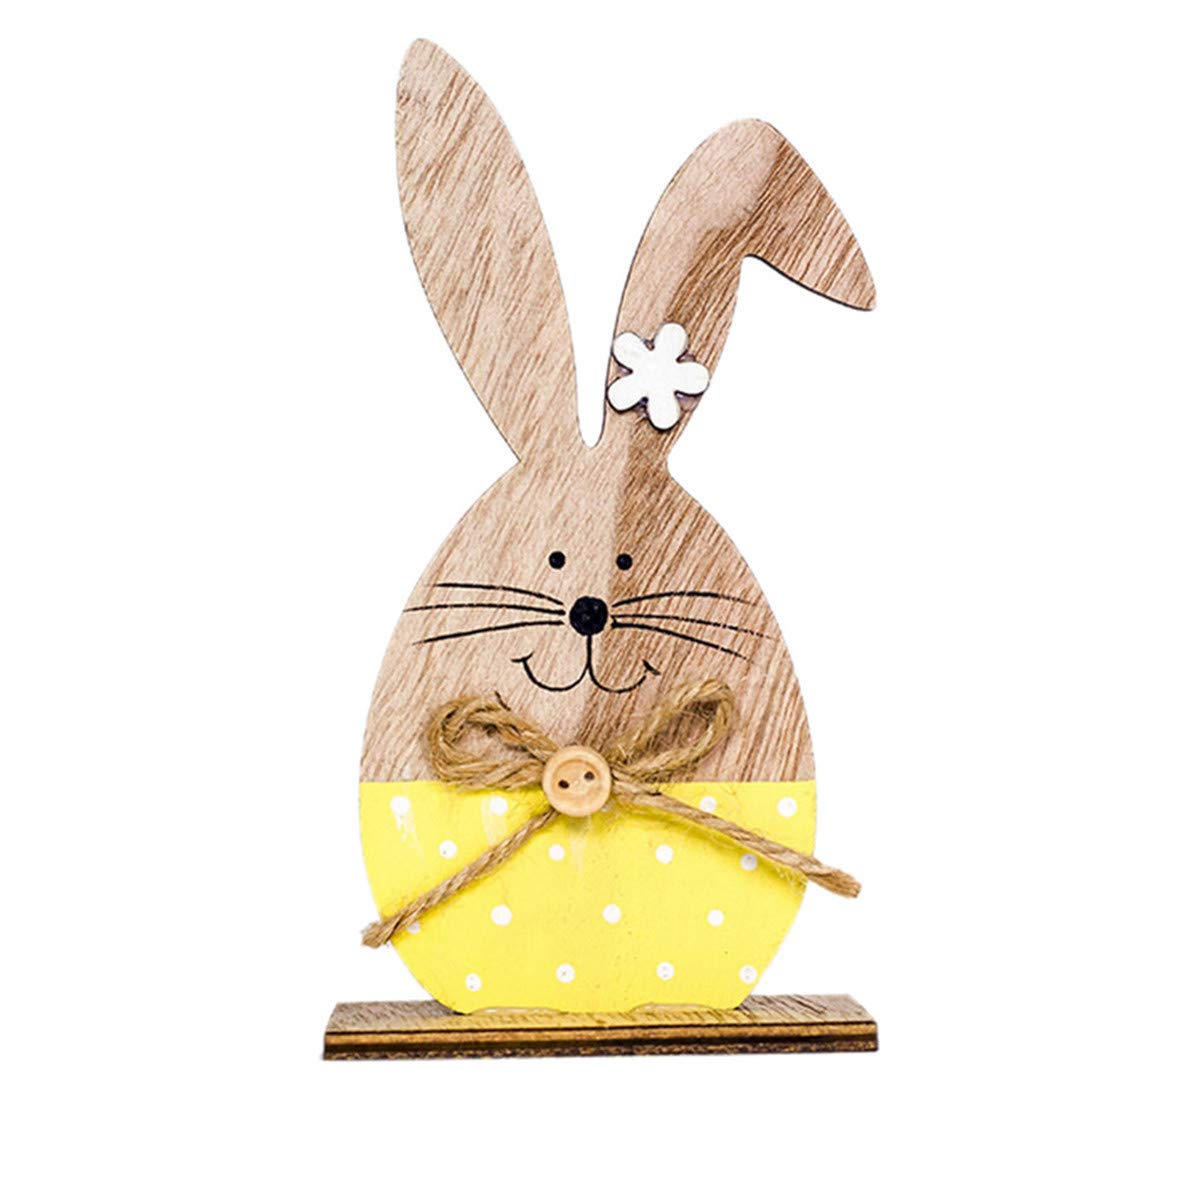 B-commerce Handmade Wooden Rabbit Shapes Ornaments Craft fü r Ostern Dekorationen Geschenke